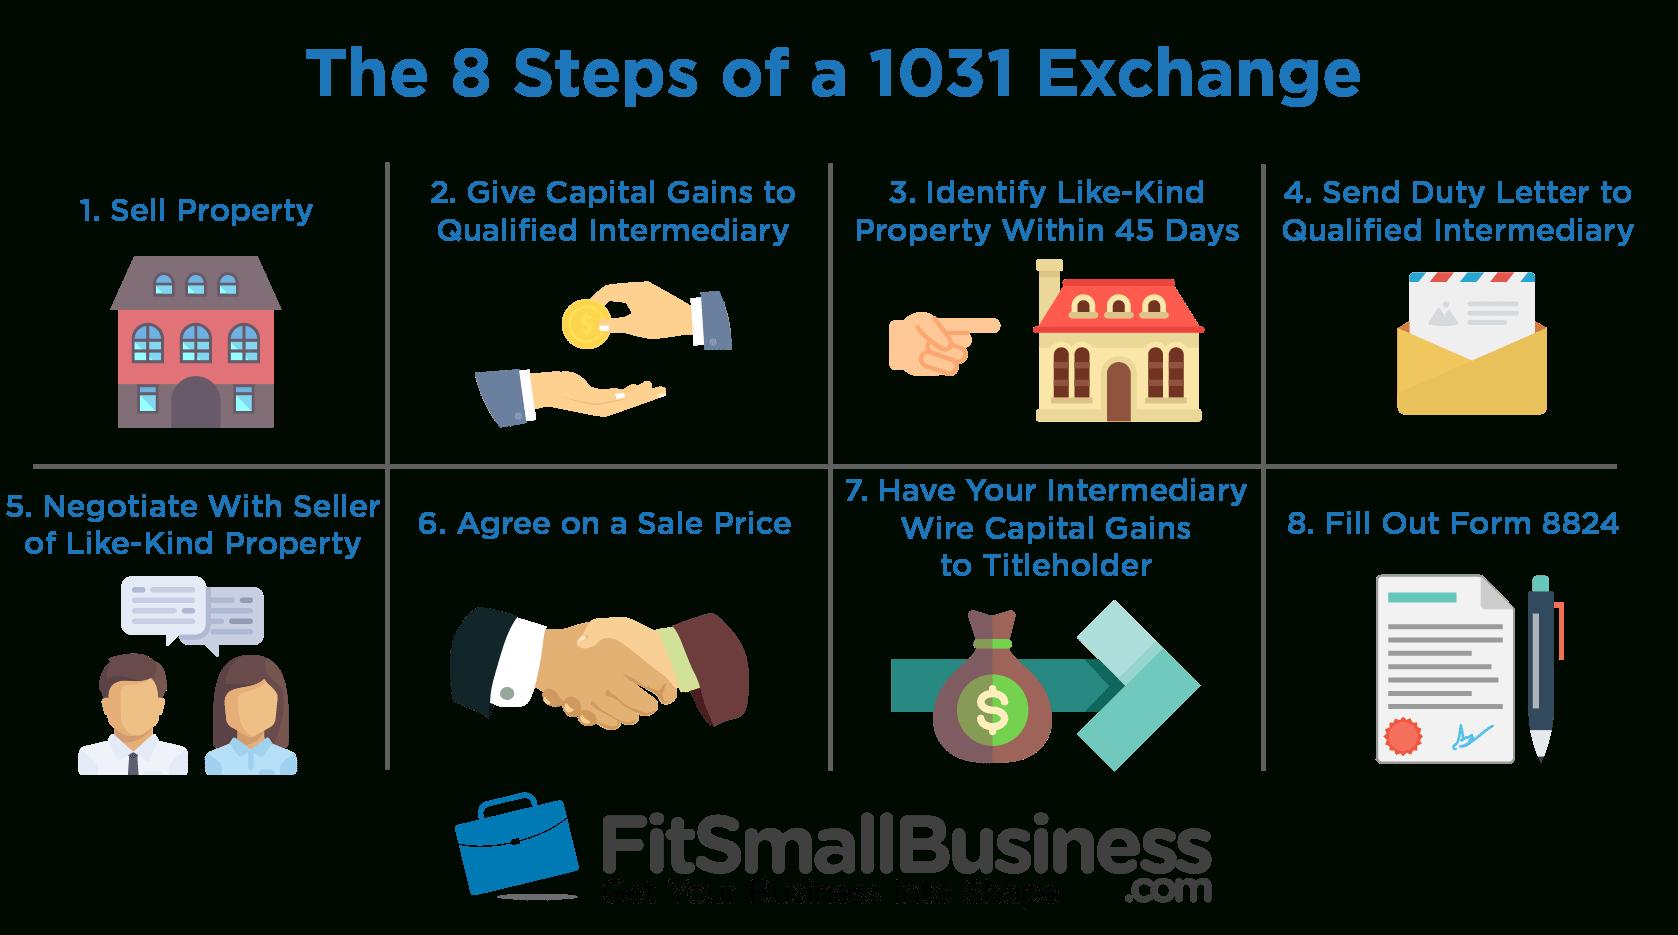 1031 Reverse Exchange Rules